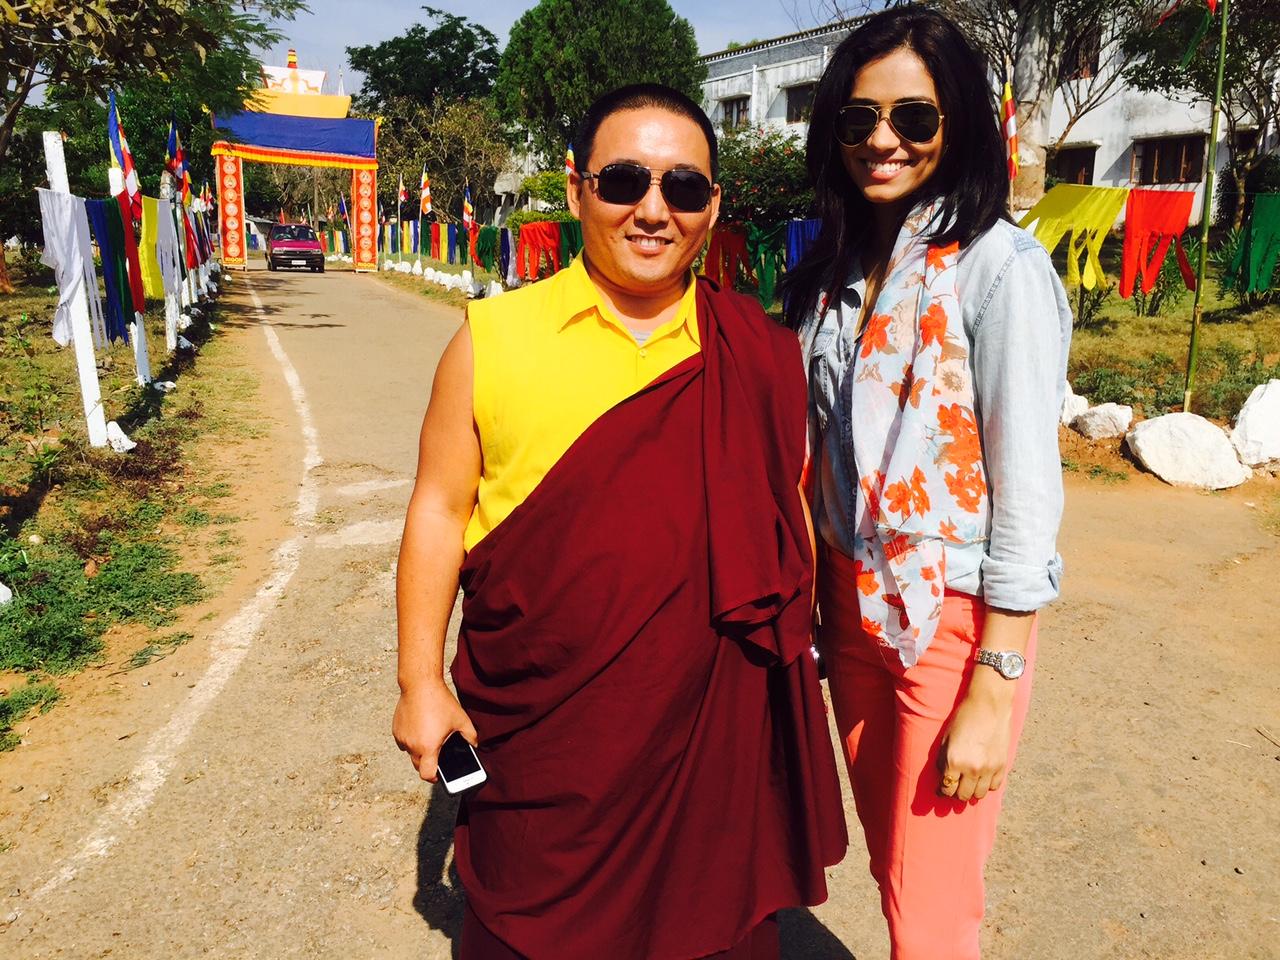 Pic_Khenpo Pama (administrator of monastery) with Gurleen Grewal